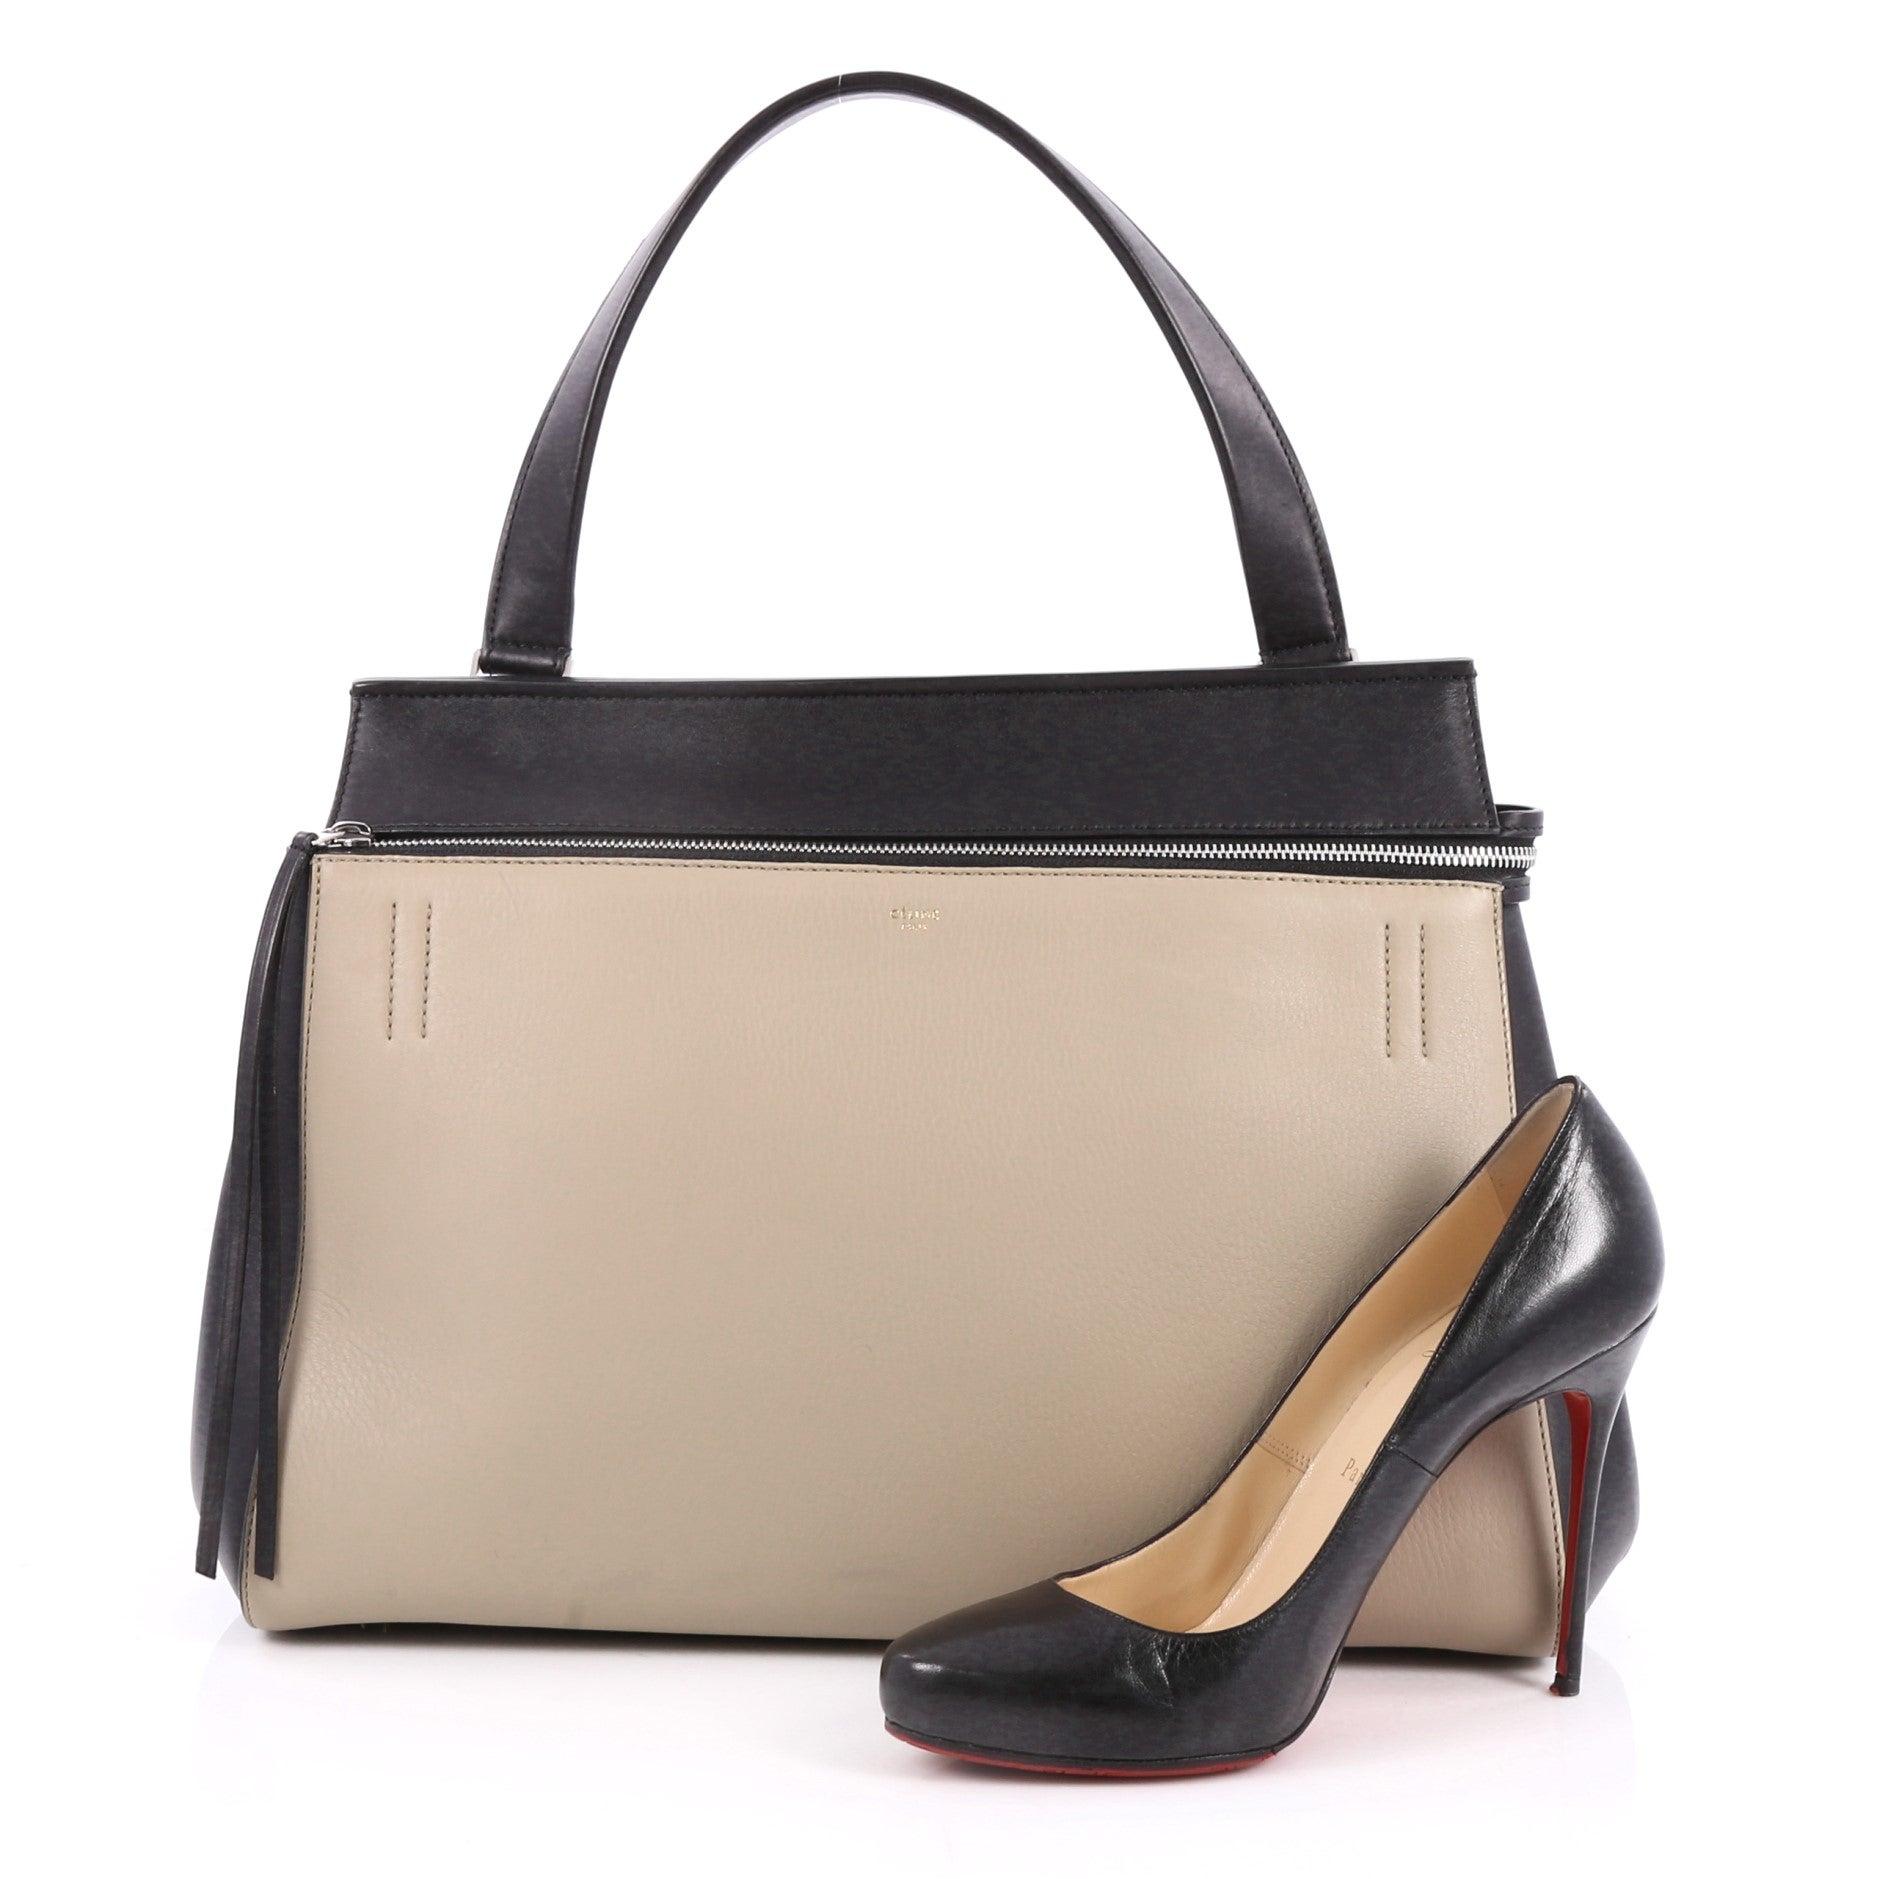 0ee00b36fda Celine Edge Bag Leather Large is the quintessential at 1stdibs